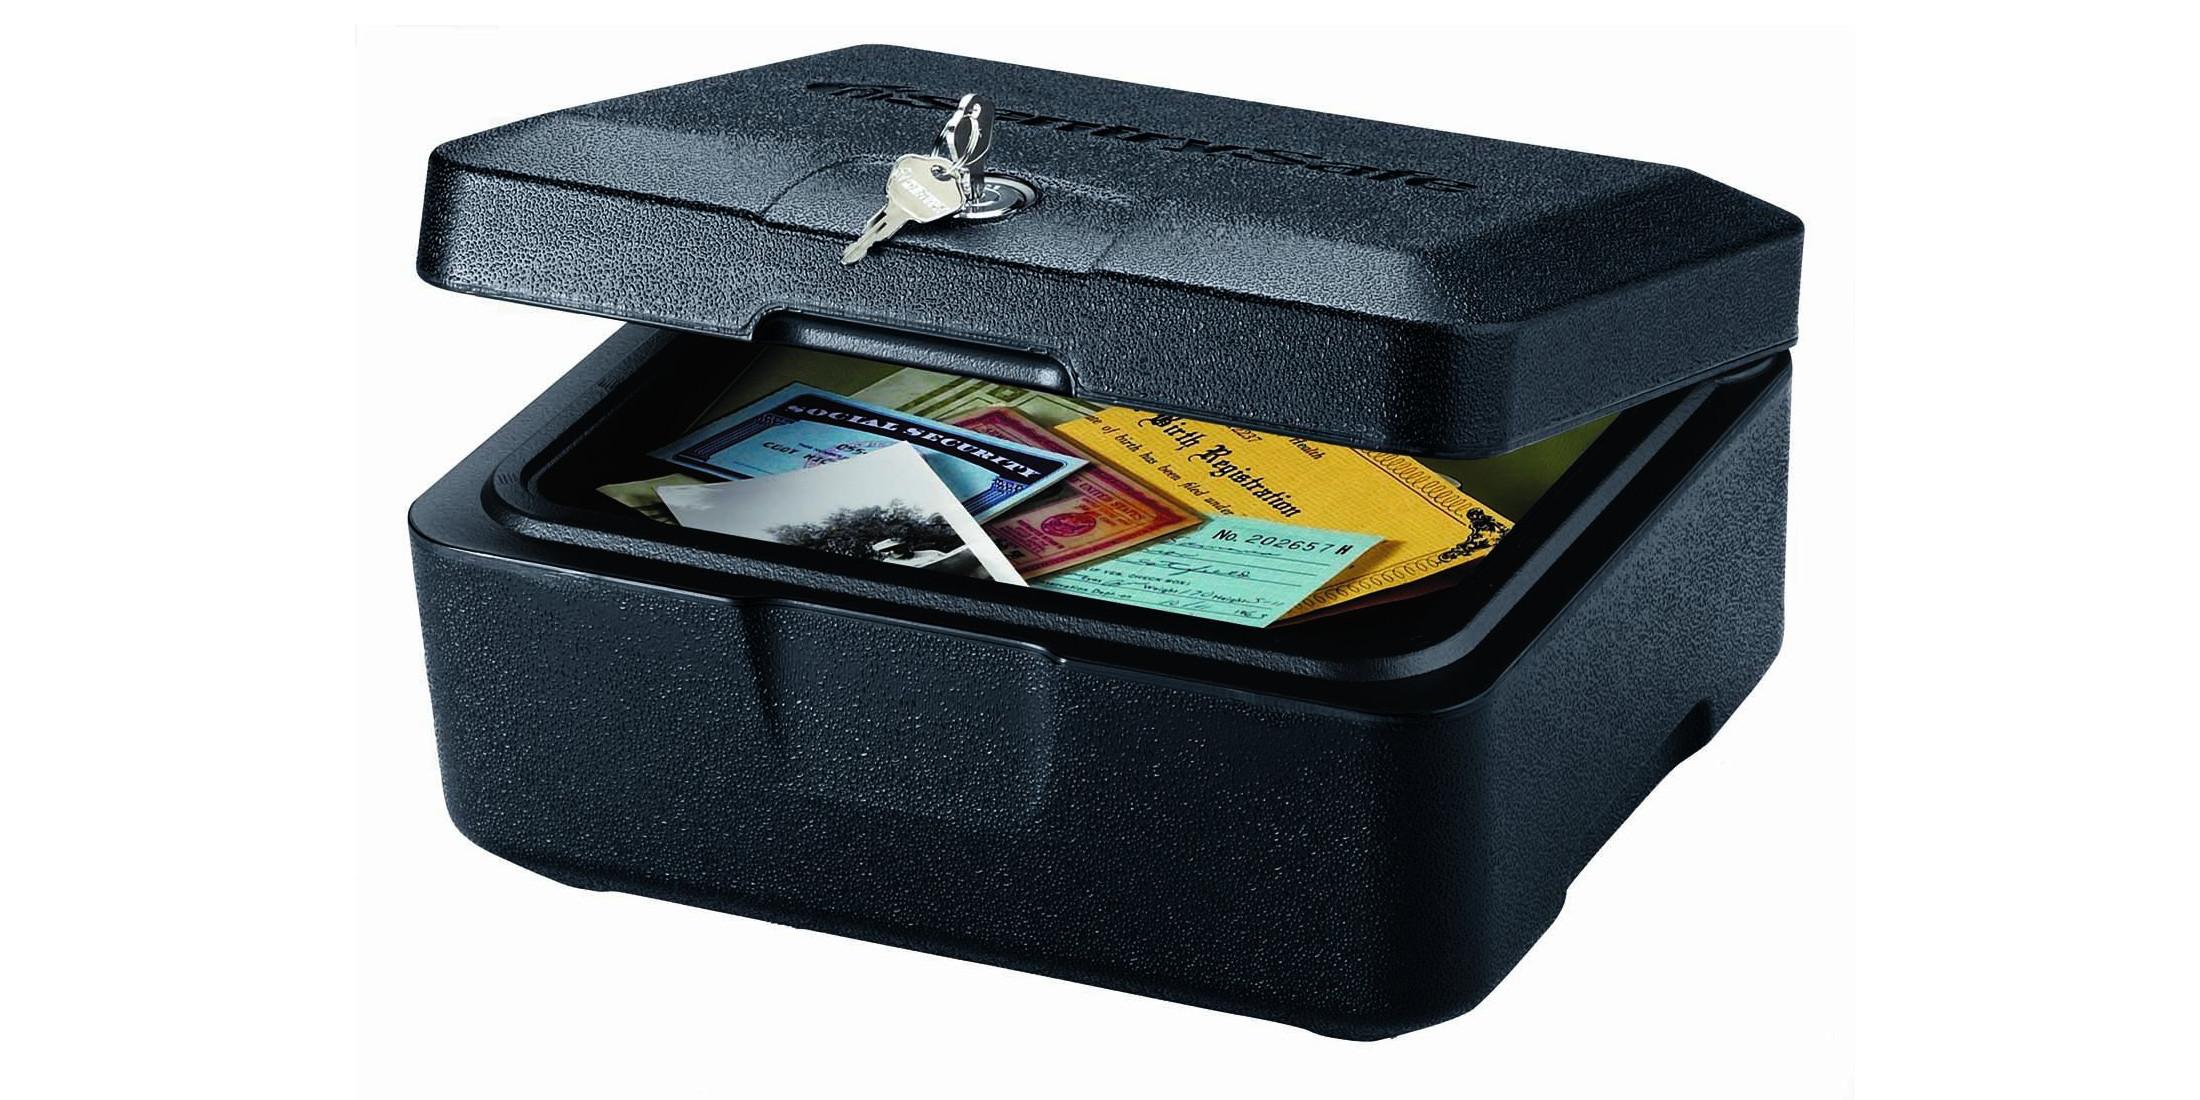 sentrysafe-500-fire-safe-box